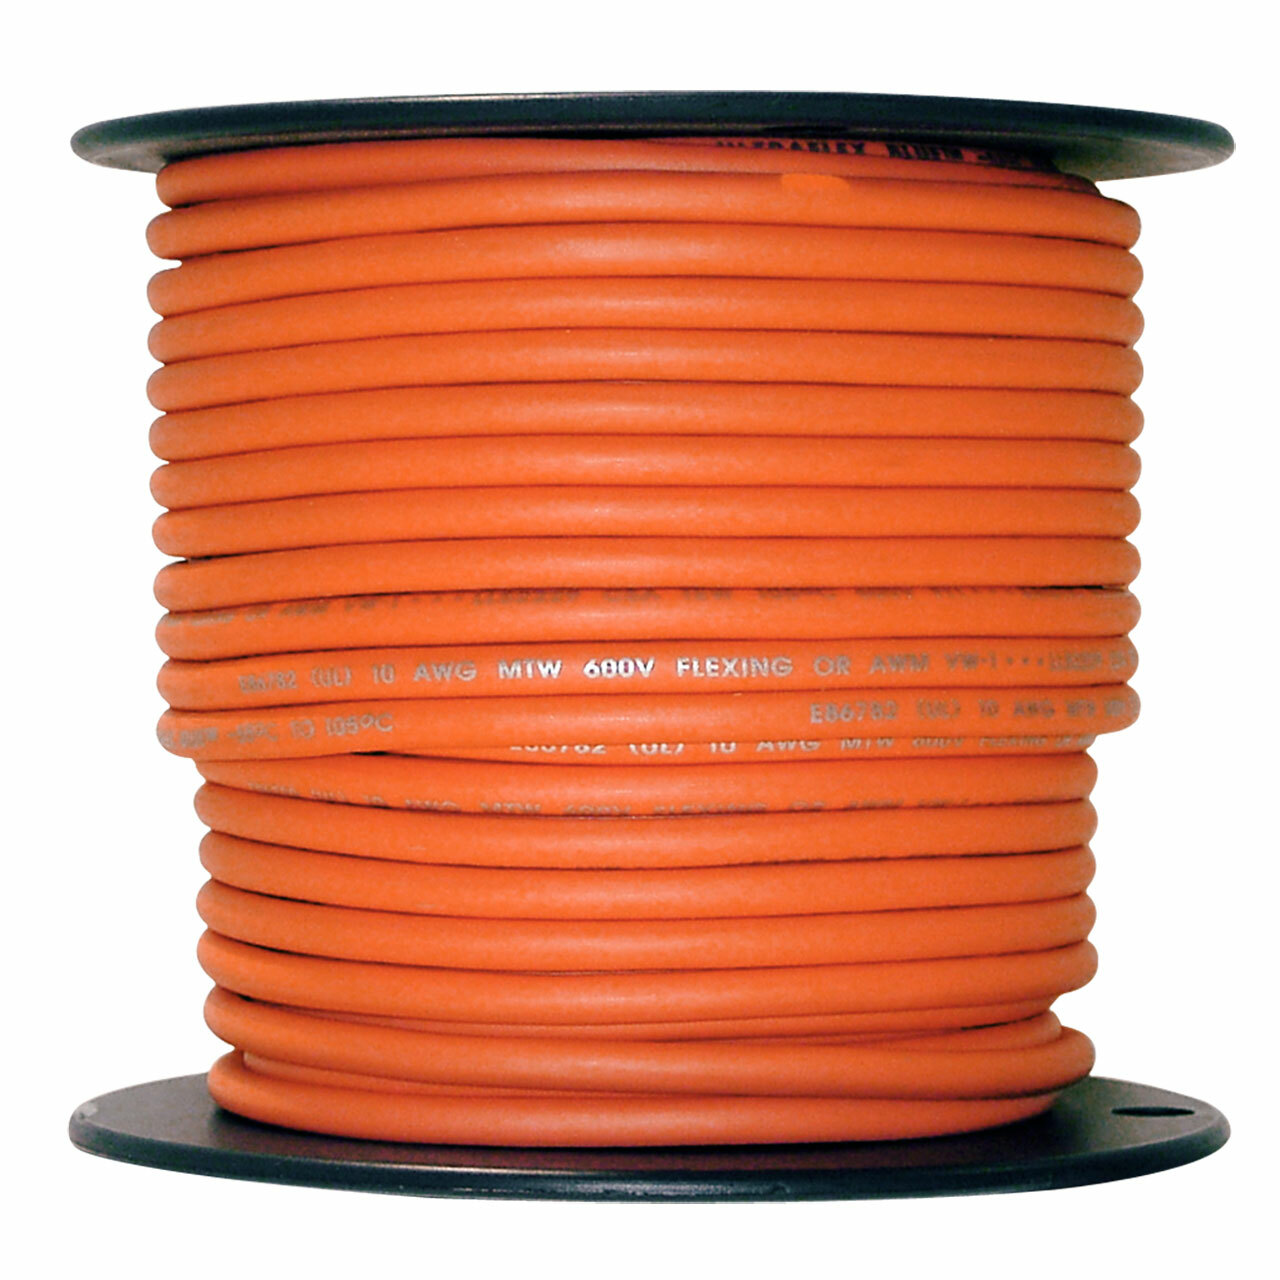 10 AWG Arctic Ultraflex Blue Single Conductor Wire 100% copper tinned fine strand, 600v applications, 500 foot spool Orange